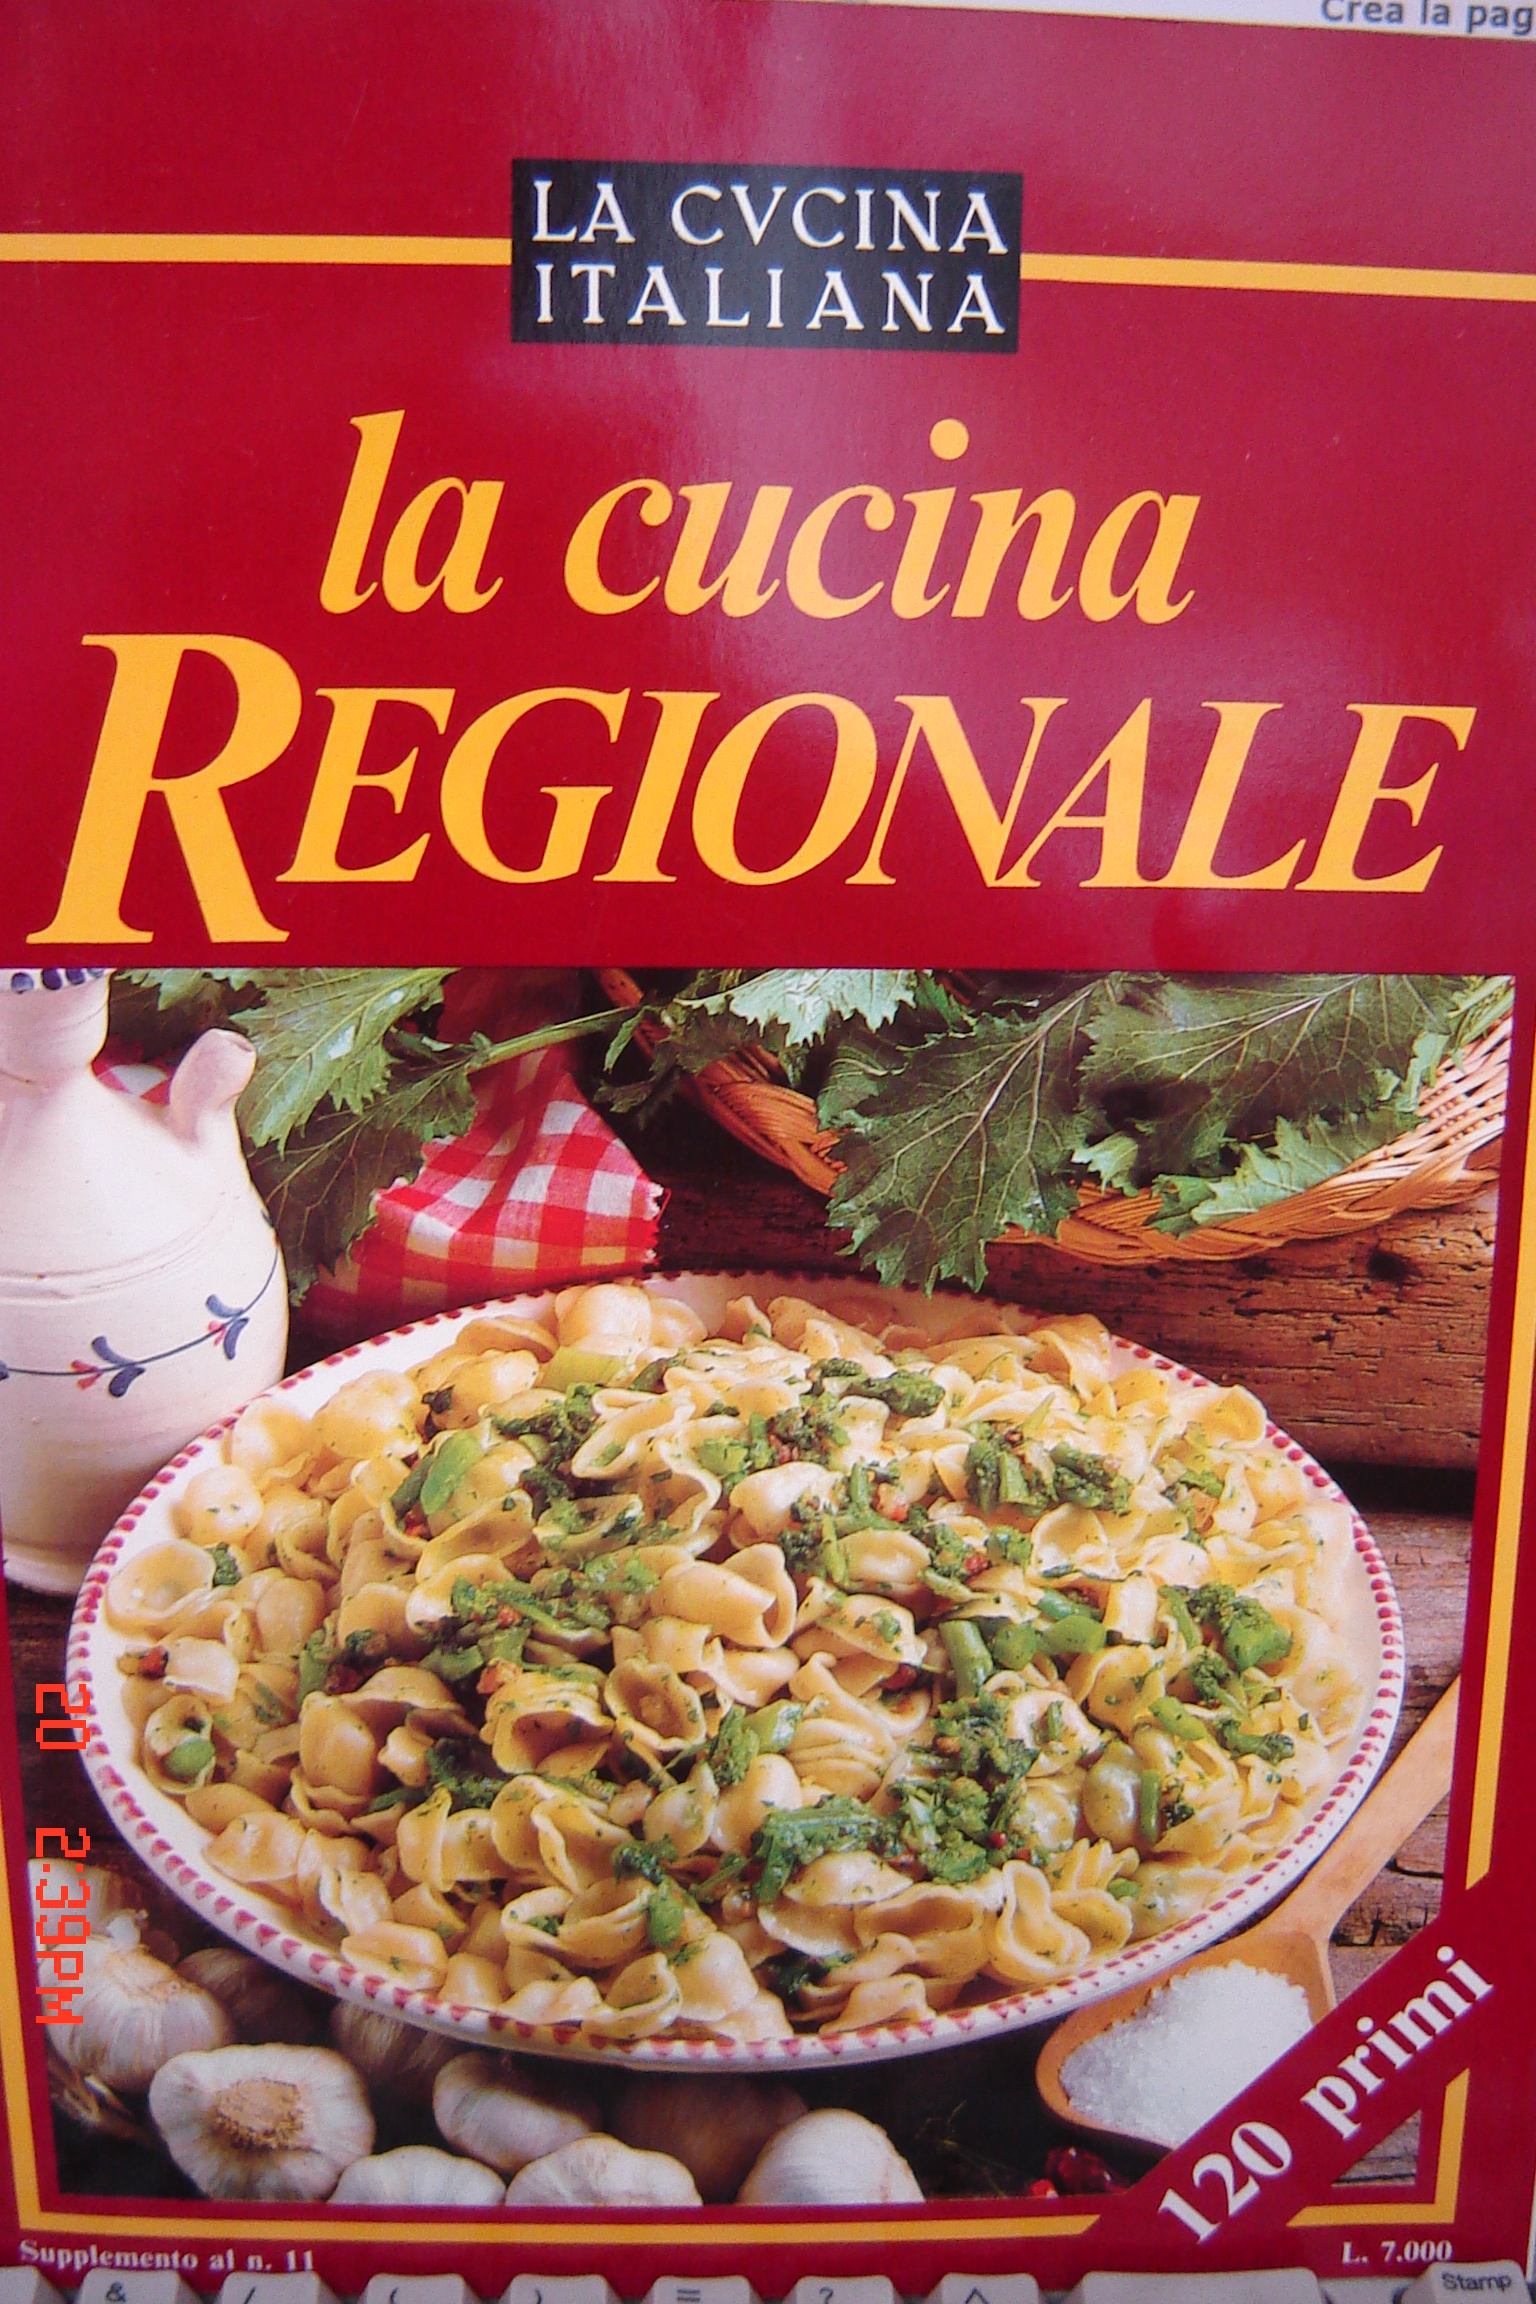 La cucina regionale